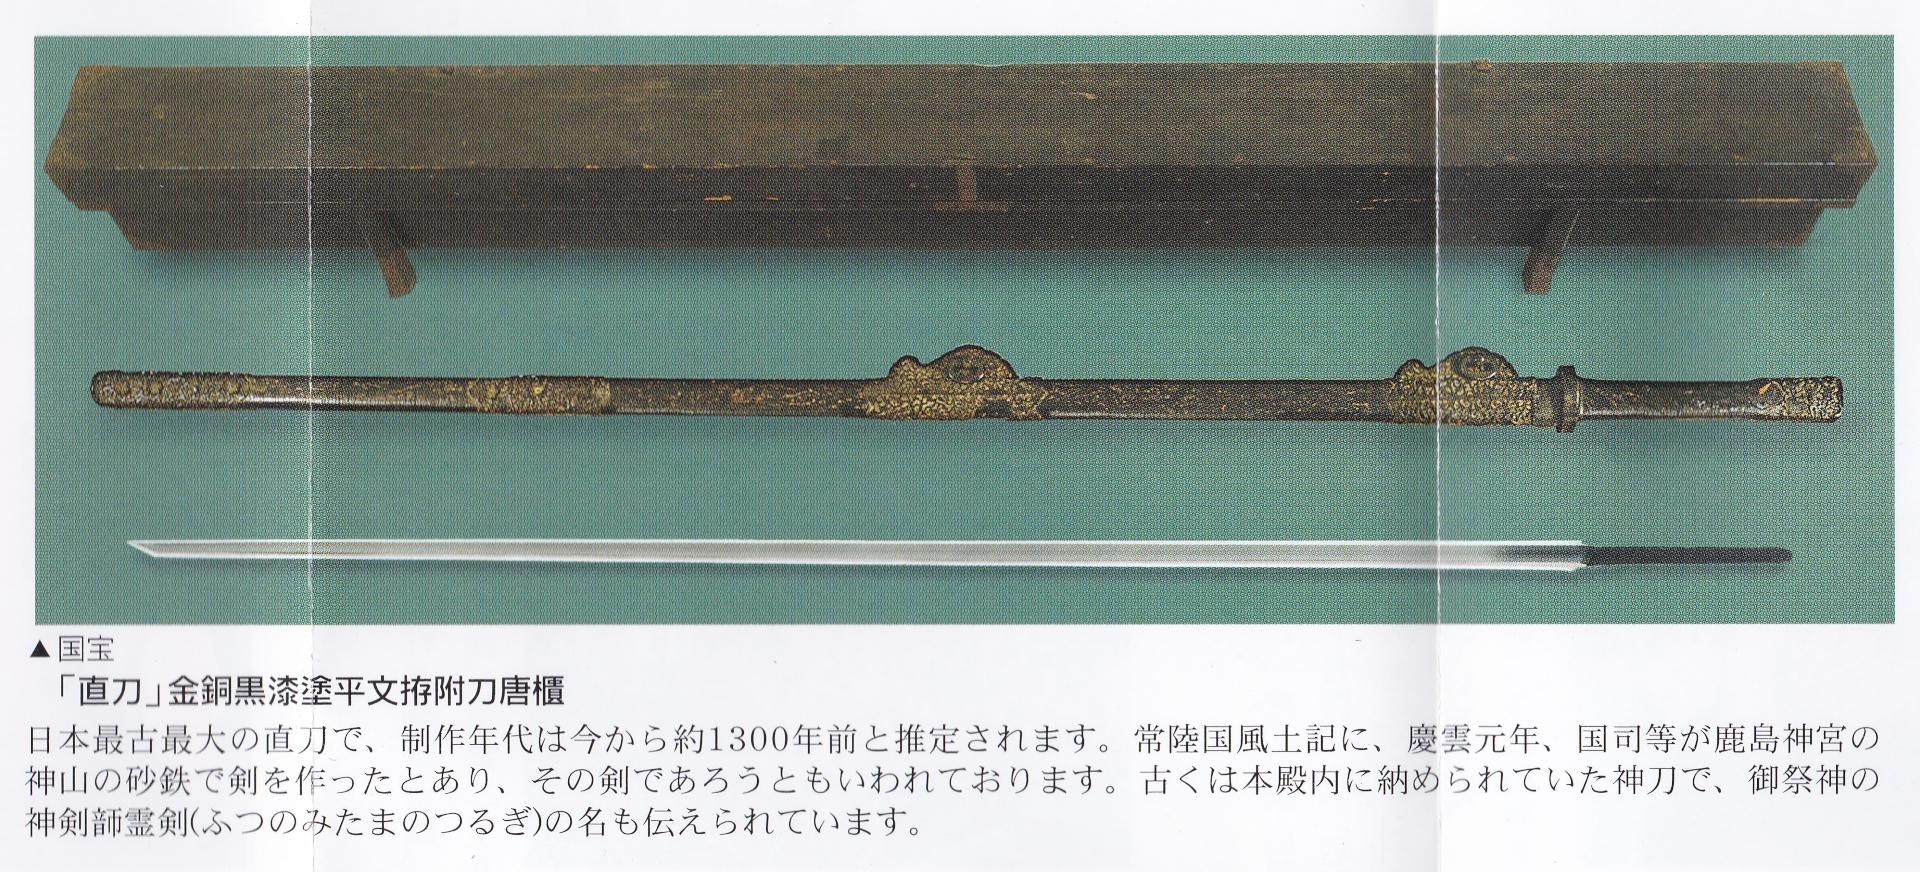 国宝、鹿島神宮の「直刀」